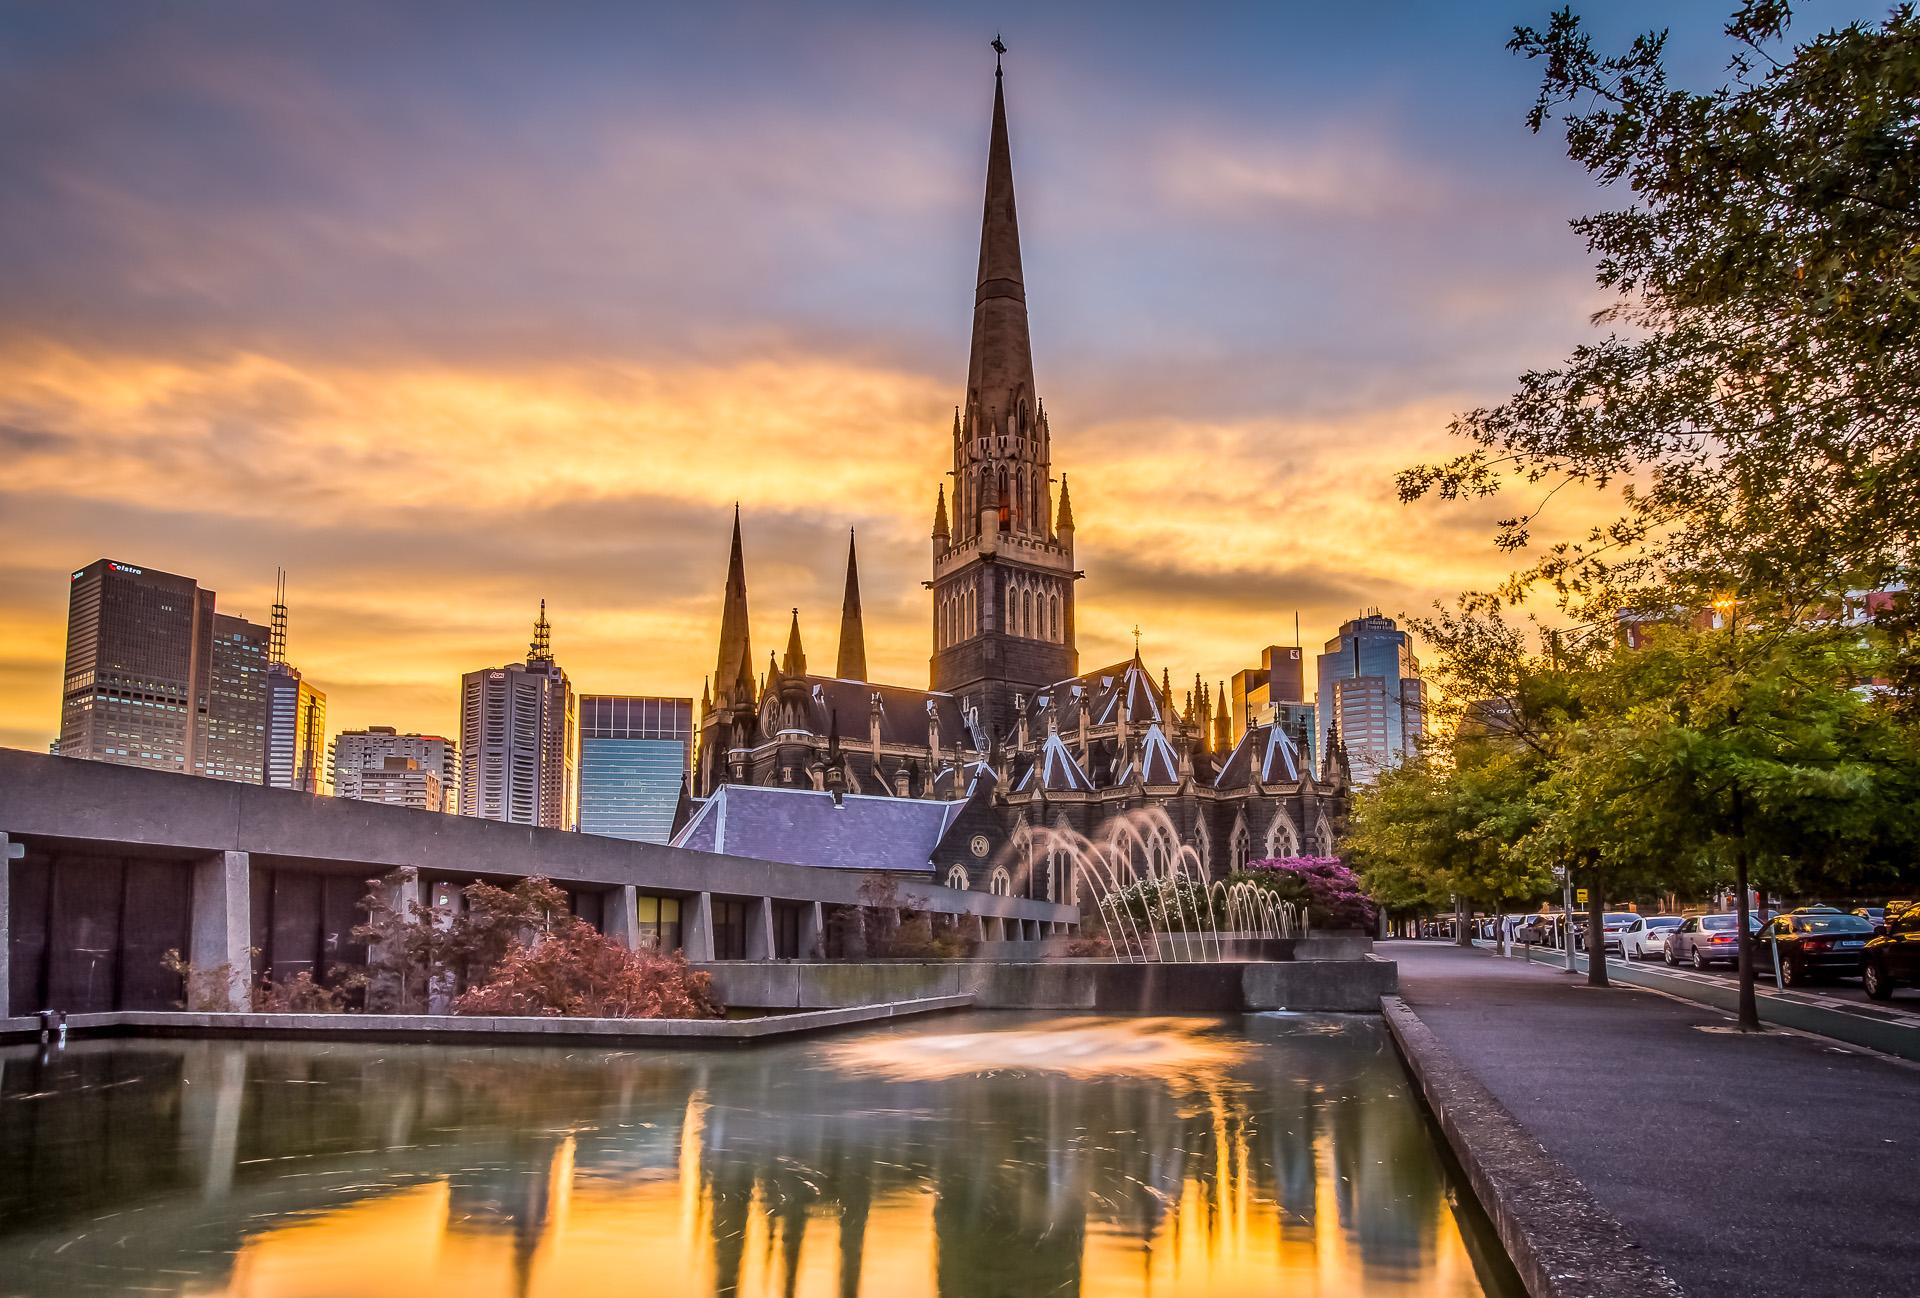 NGÀY 04: SYDNEY - MELBOURNE               Ăn sáng, trưa, tối